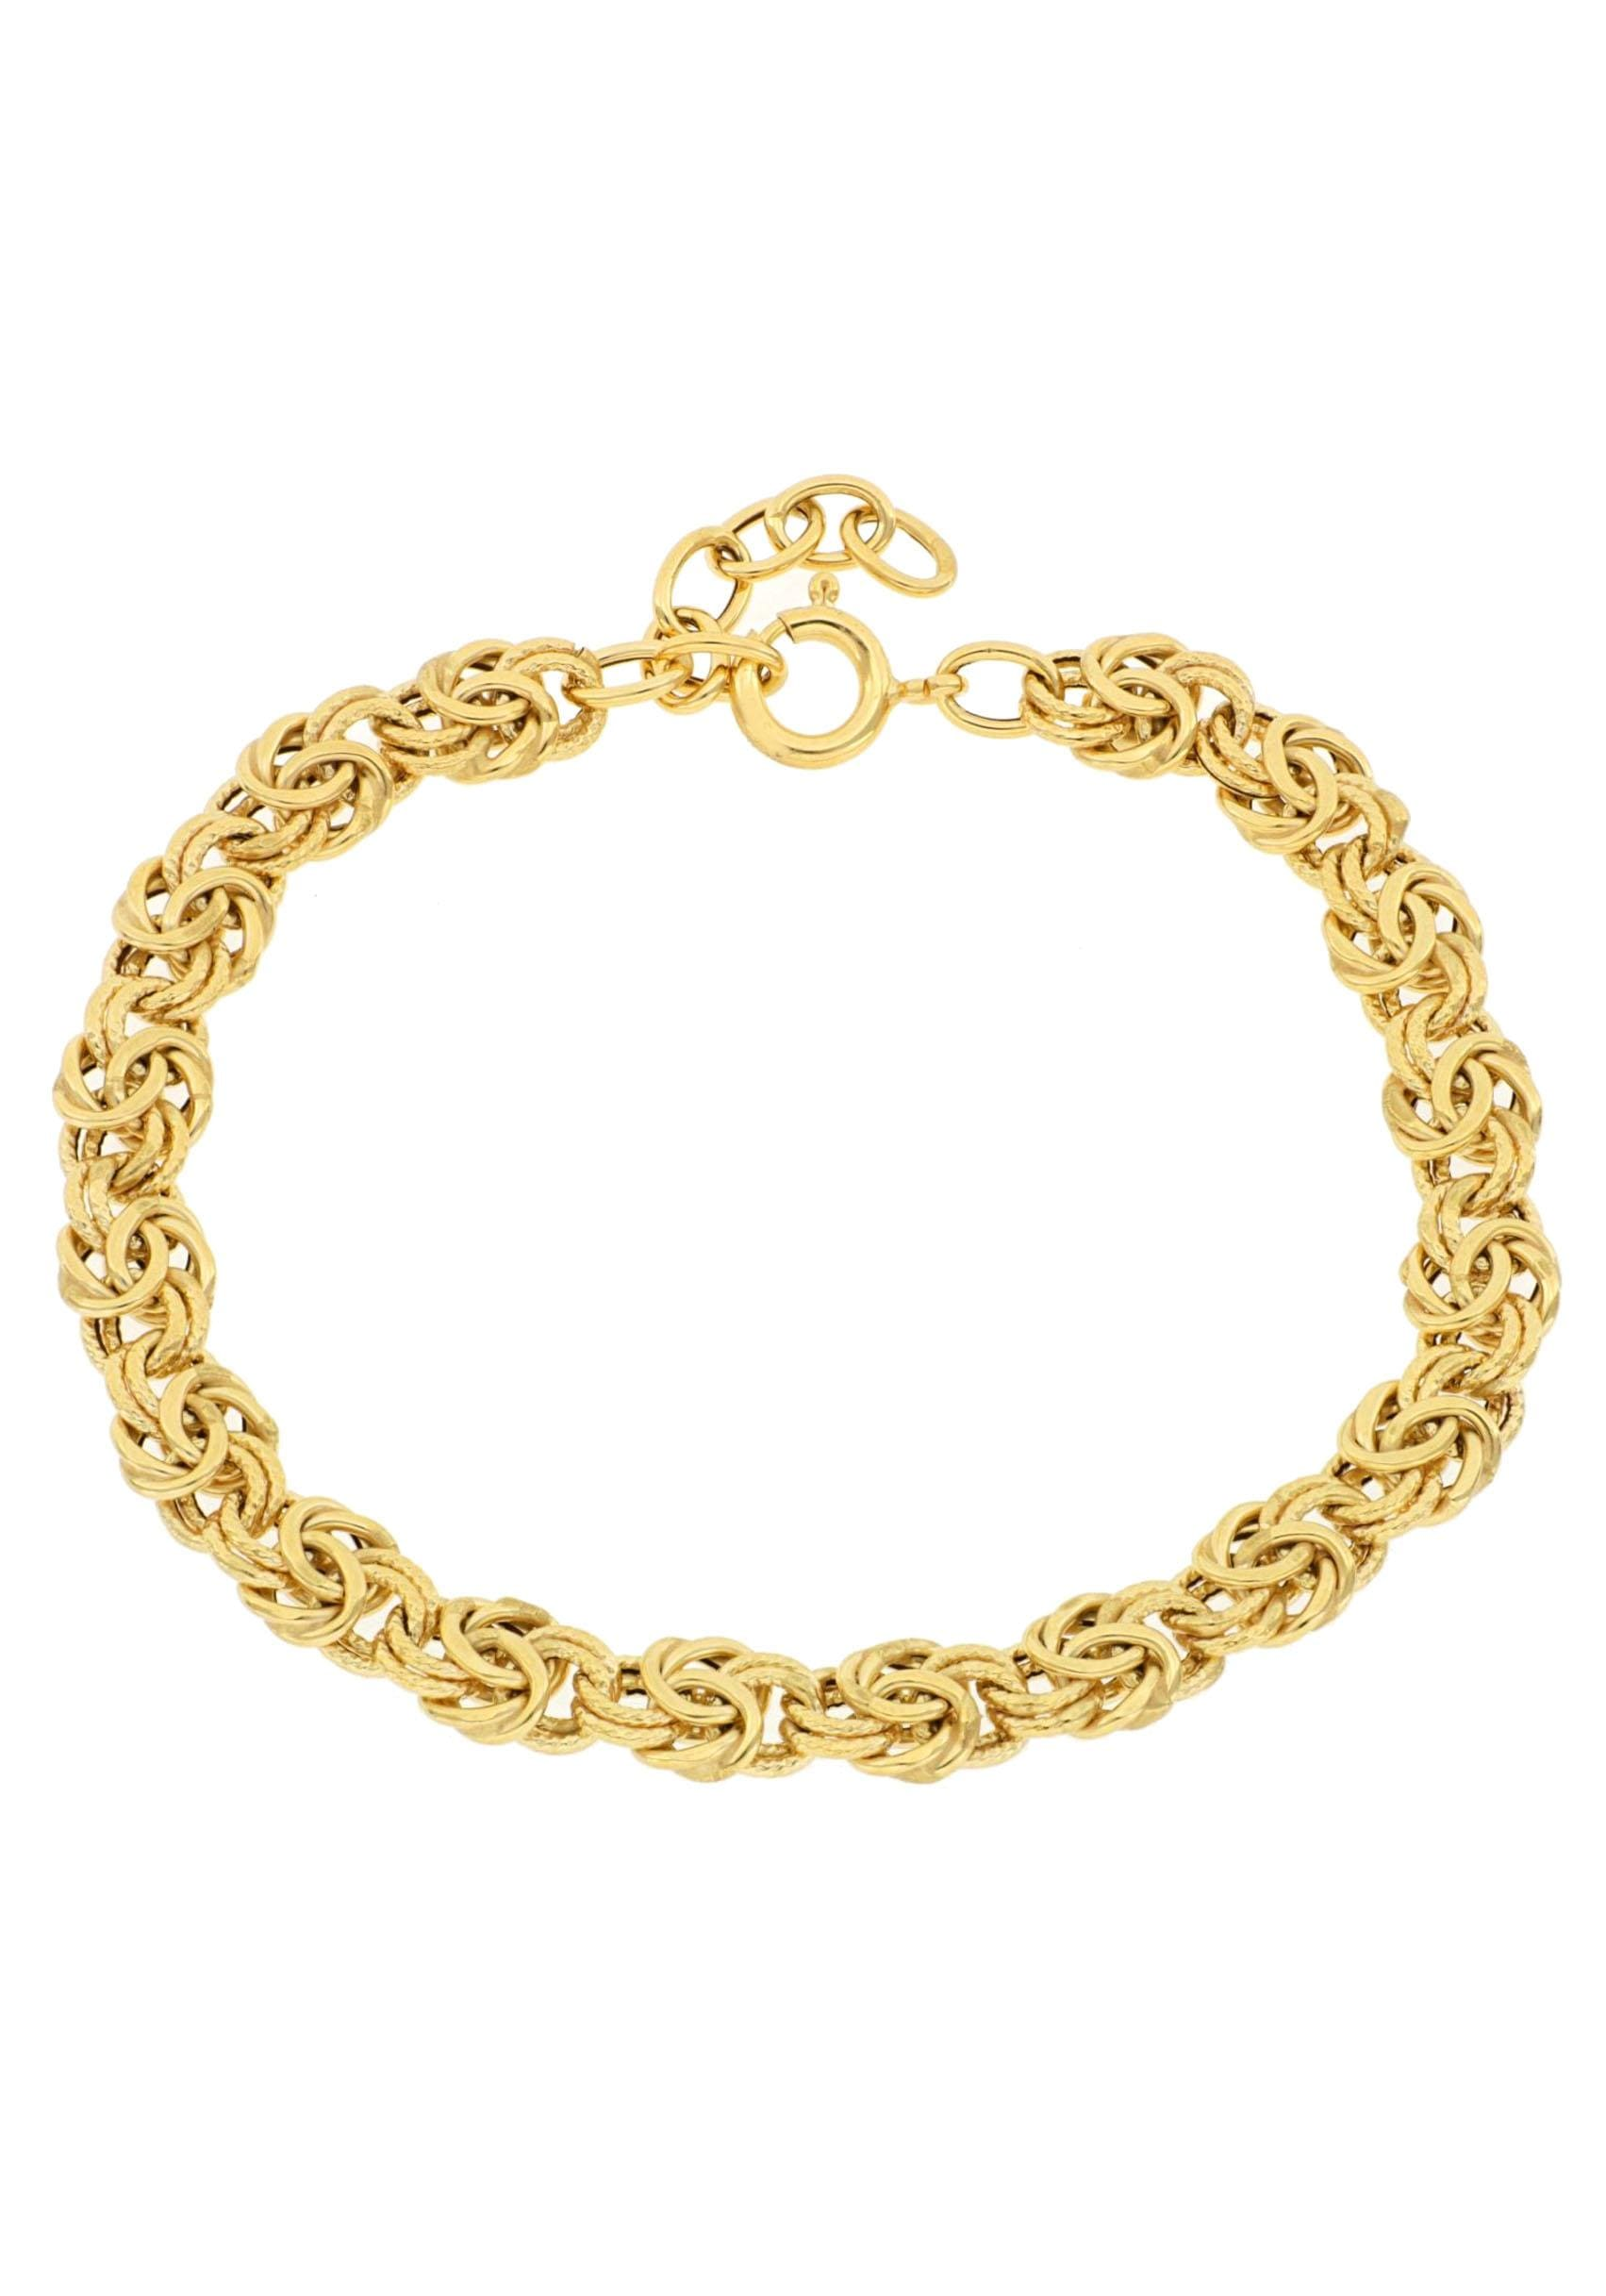 Firetti Goldarmband »Glanz, gleichlaufend, zisiliert, Königskettengliederung«   Schmuck > Armbänder > Goldarmbänder   FIRETTI